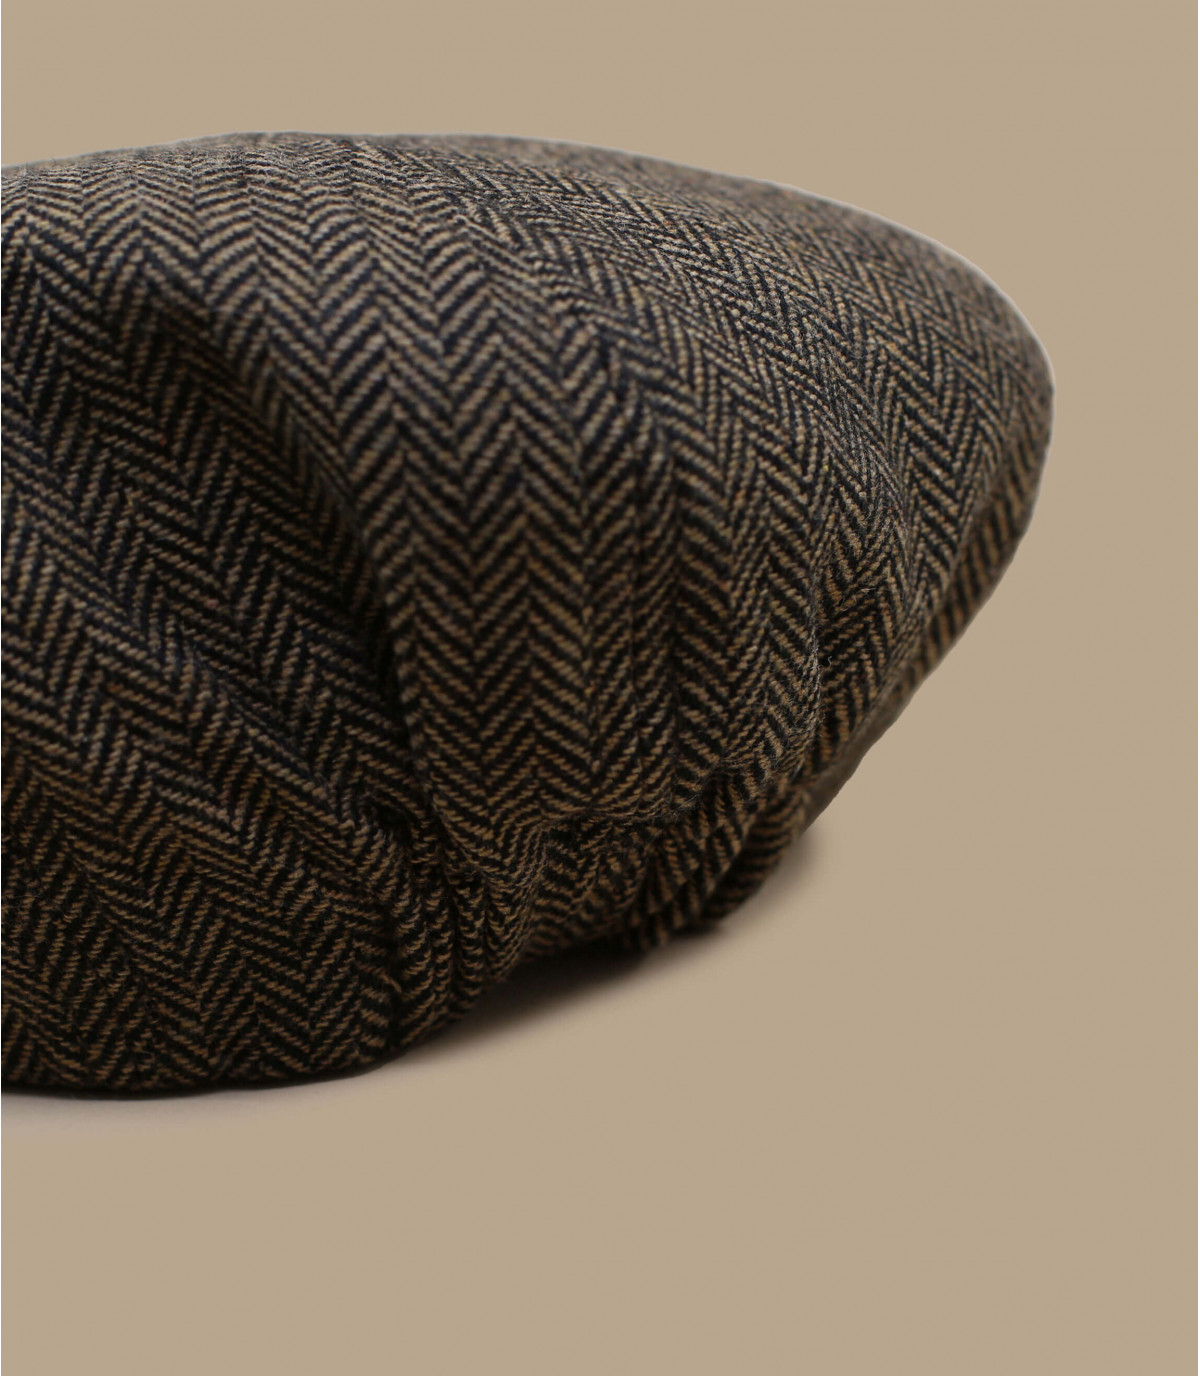 Details LI'L Brood brown khaki - afbeeling 2